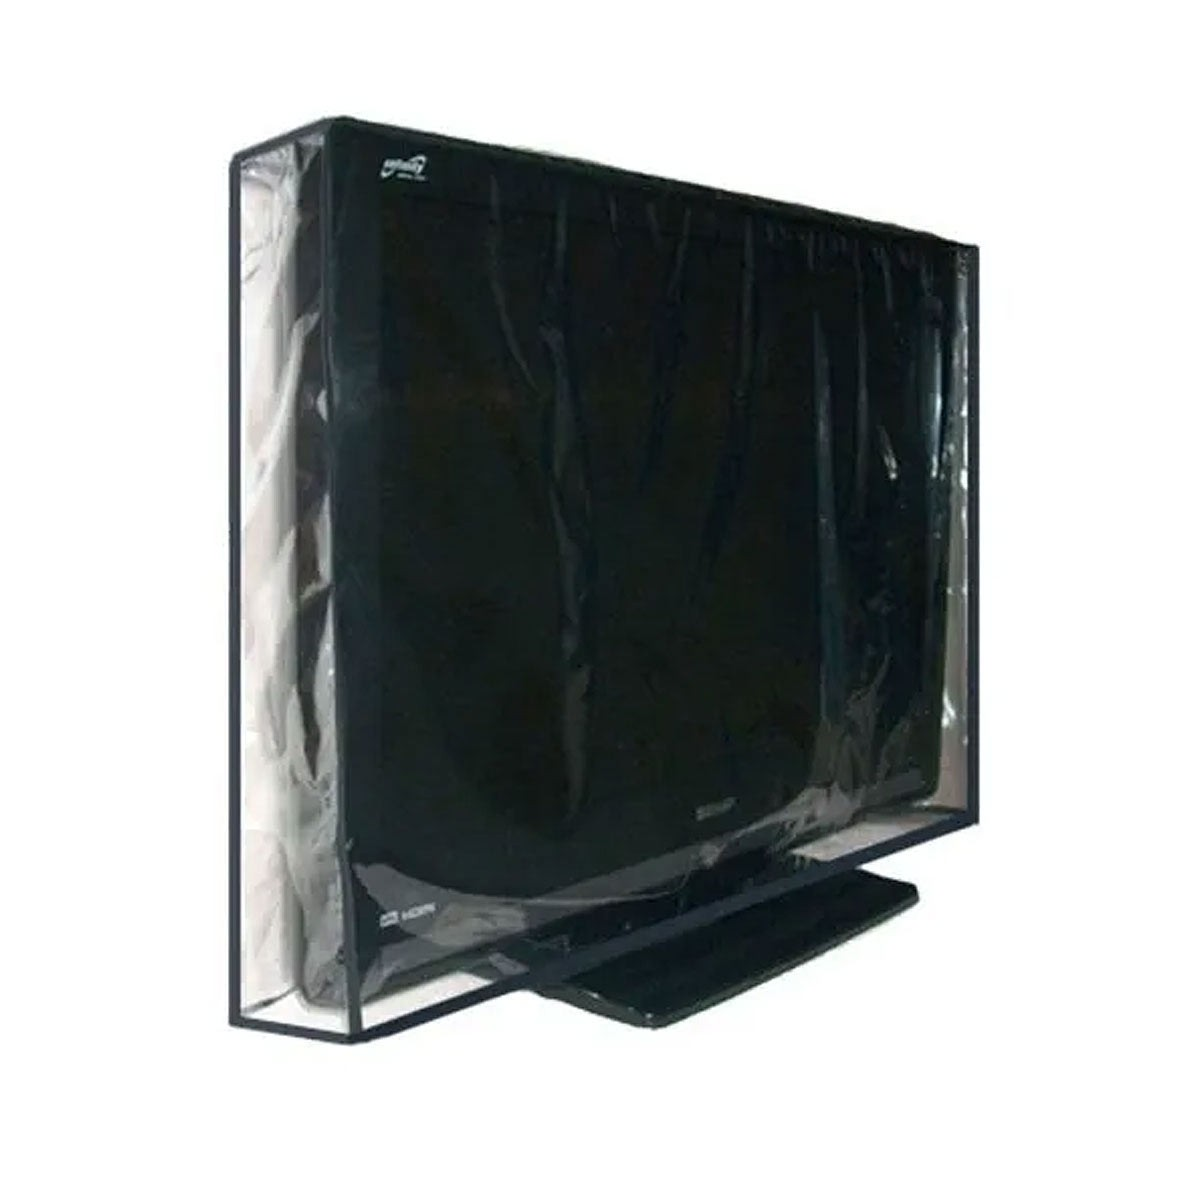 Capa Para Tv Led 55 Pvc Cristal - Aberta Atrás